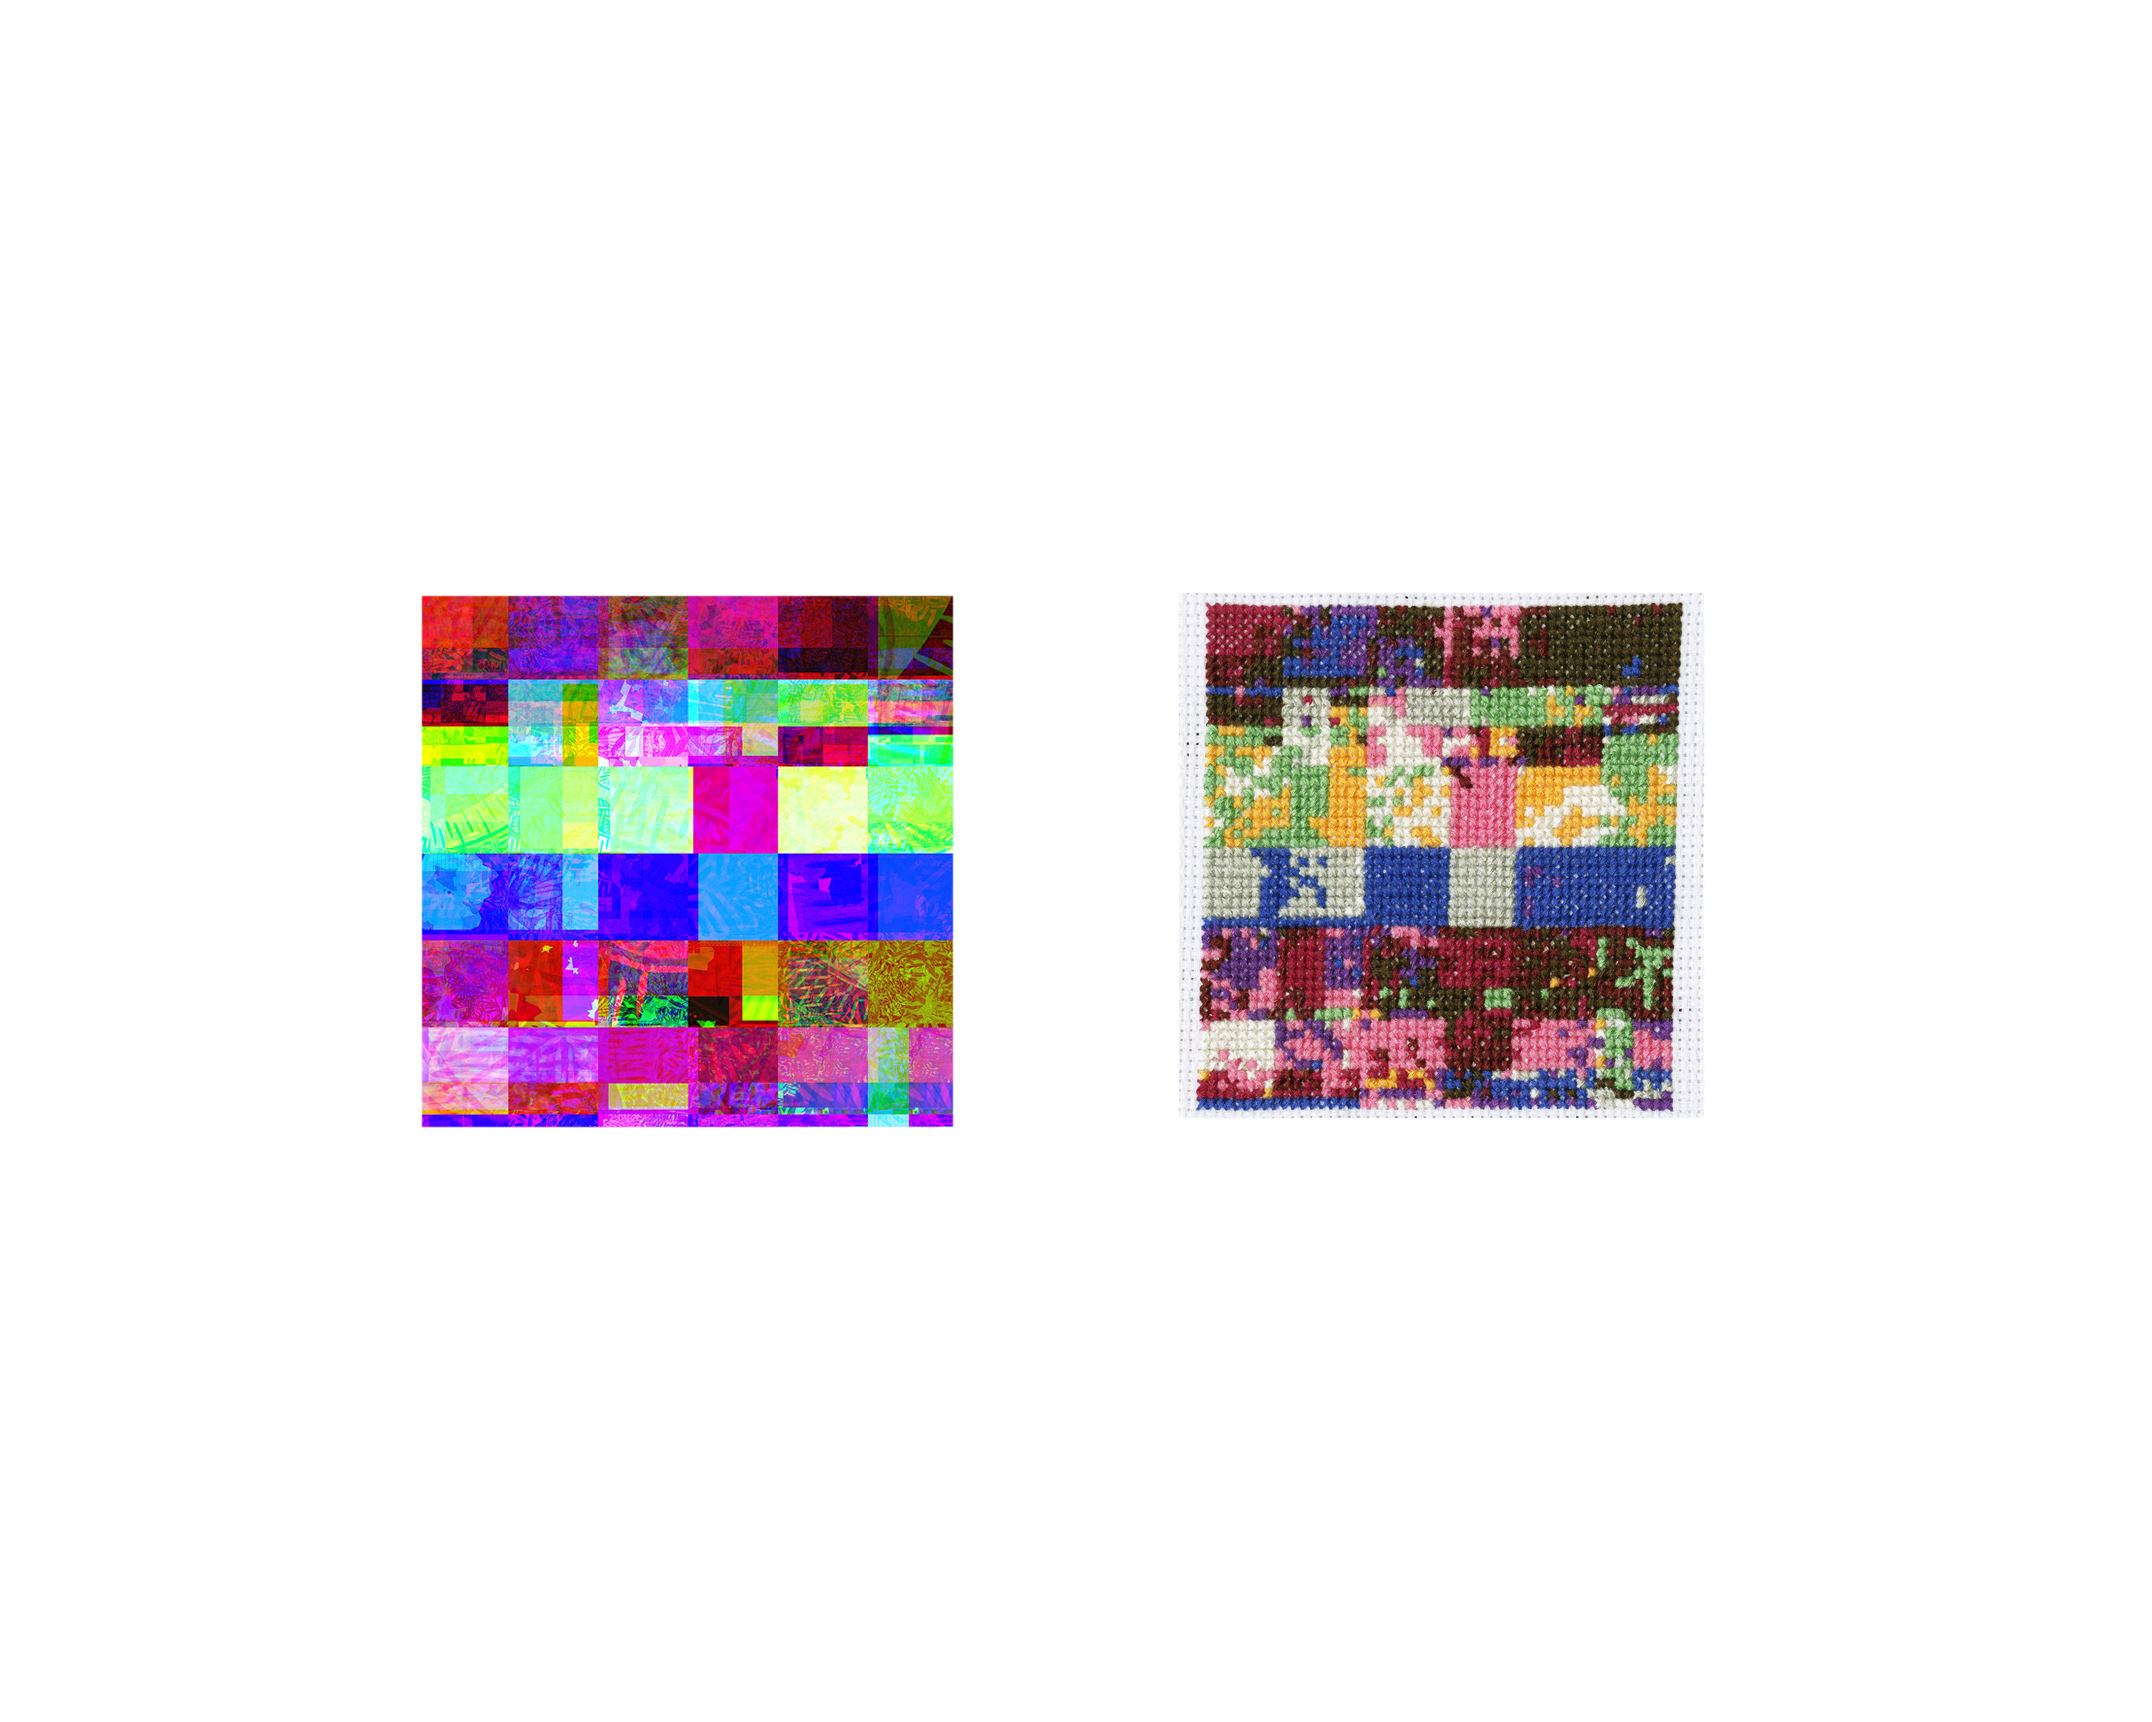 Glitch Series 01 - Crop_1.jpg